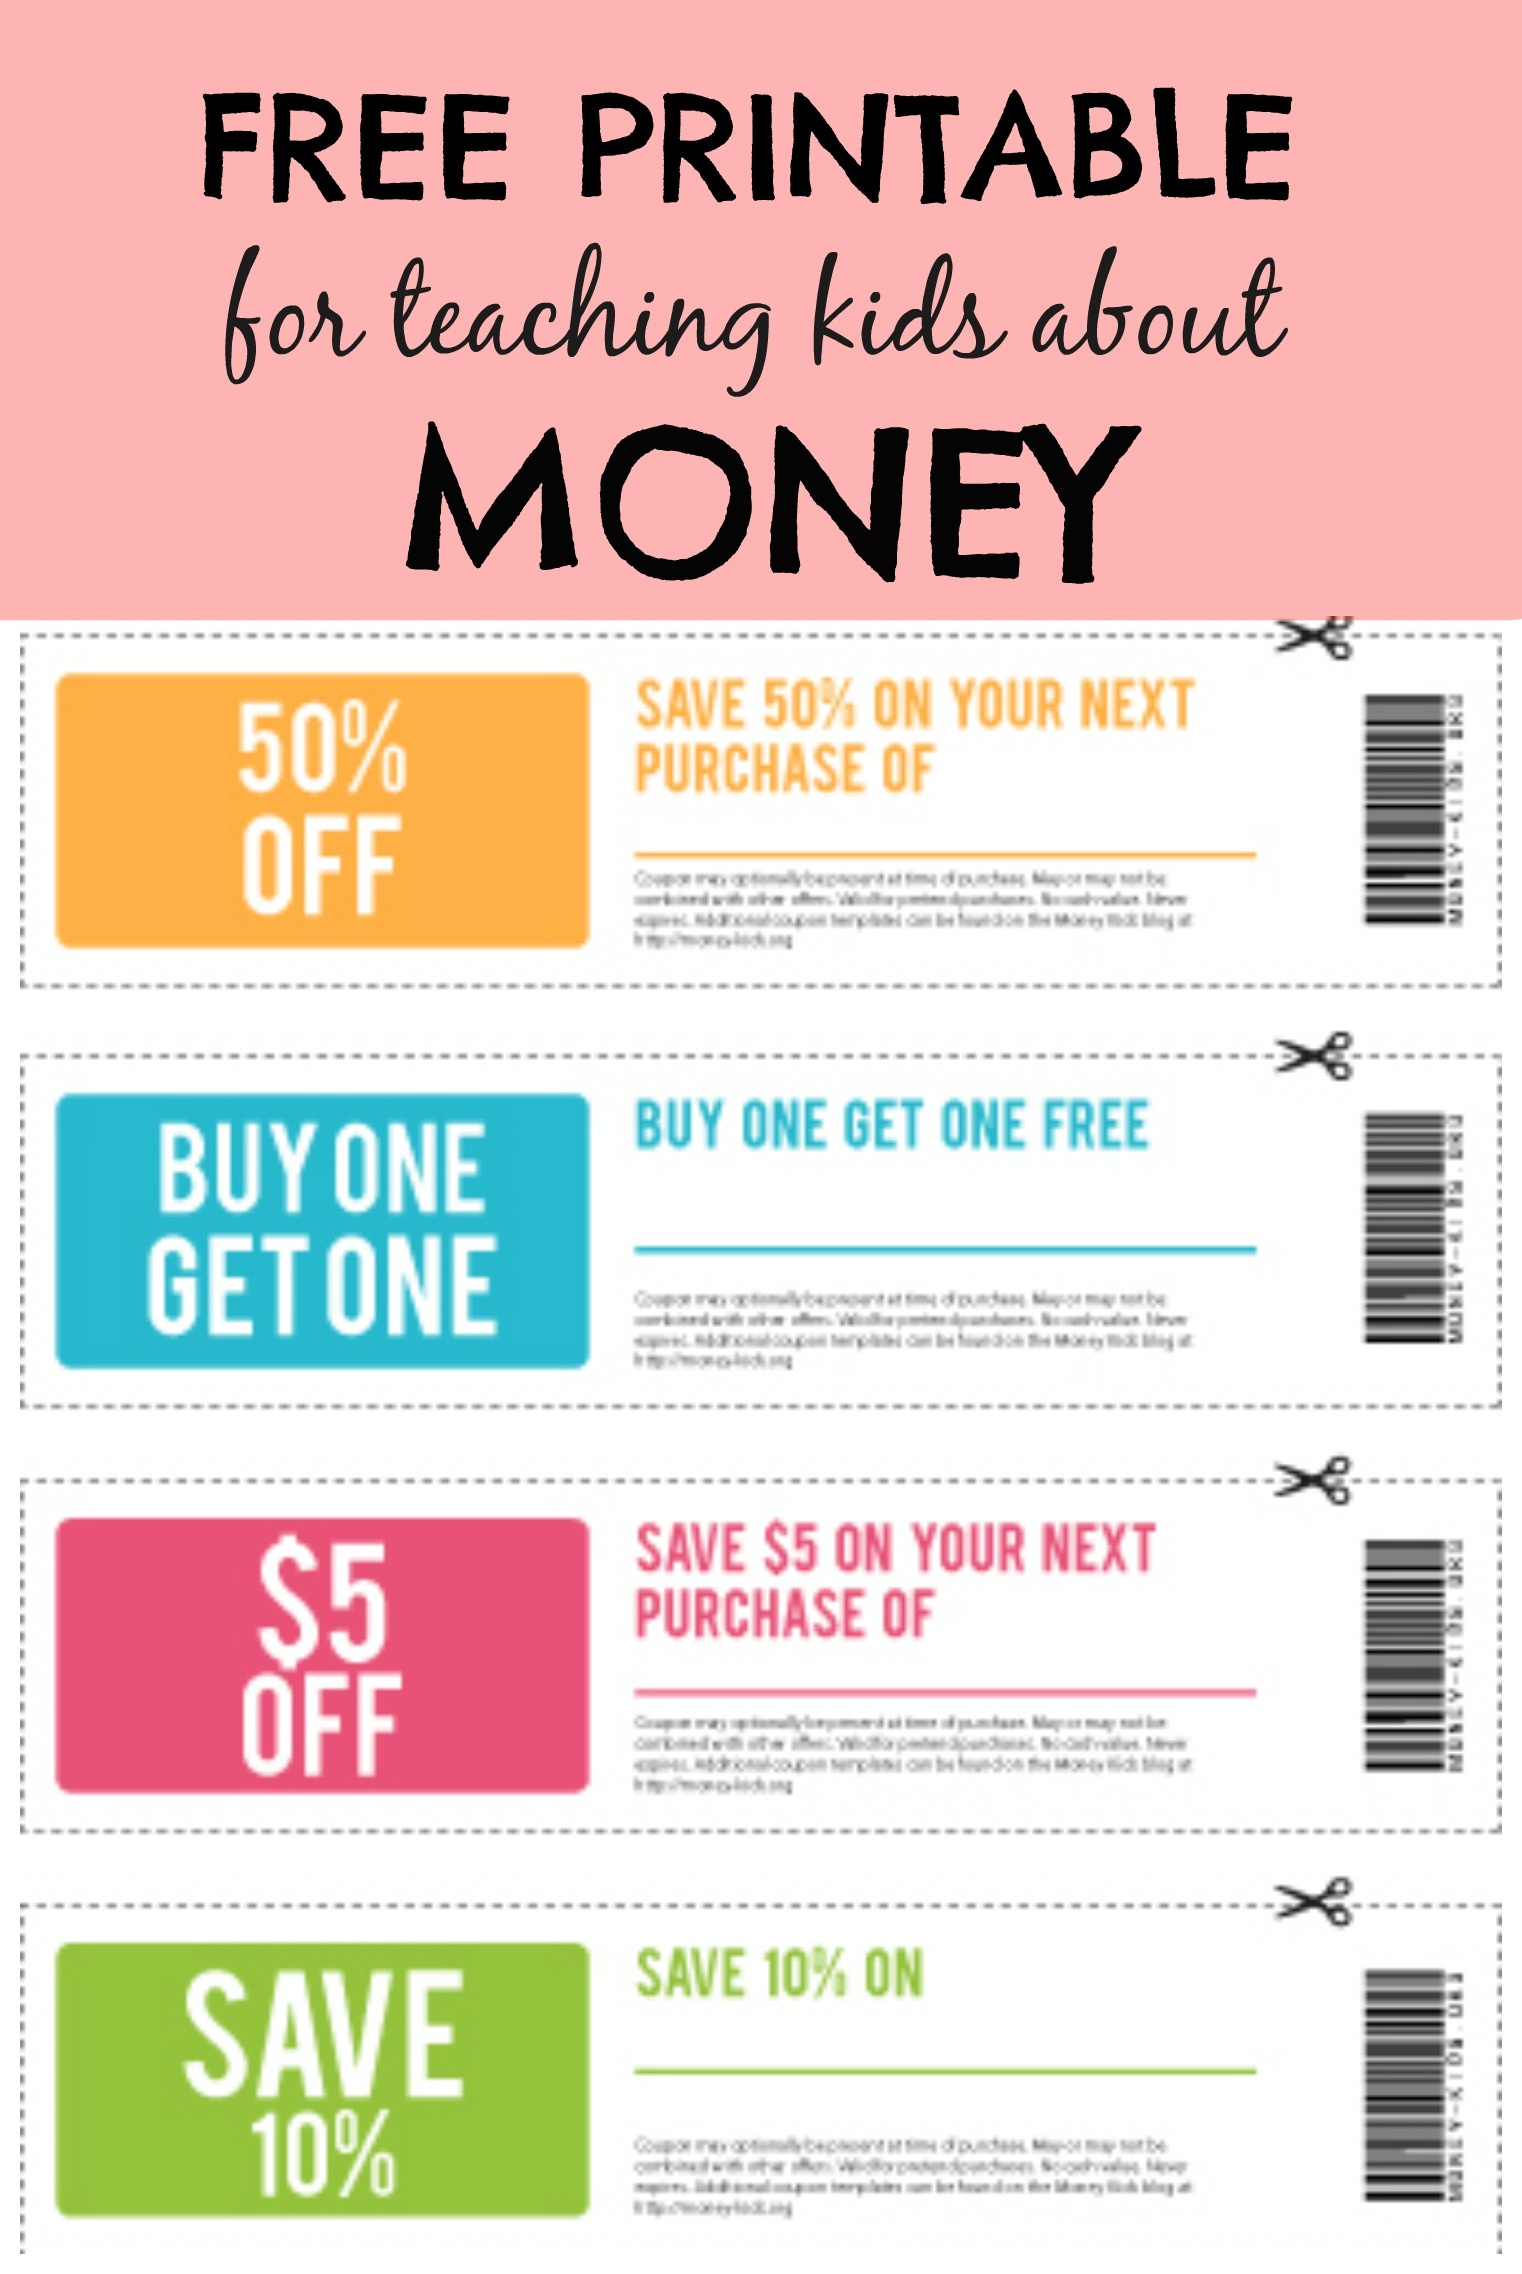 Free Printable Money For Kids